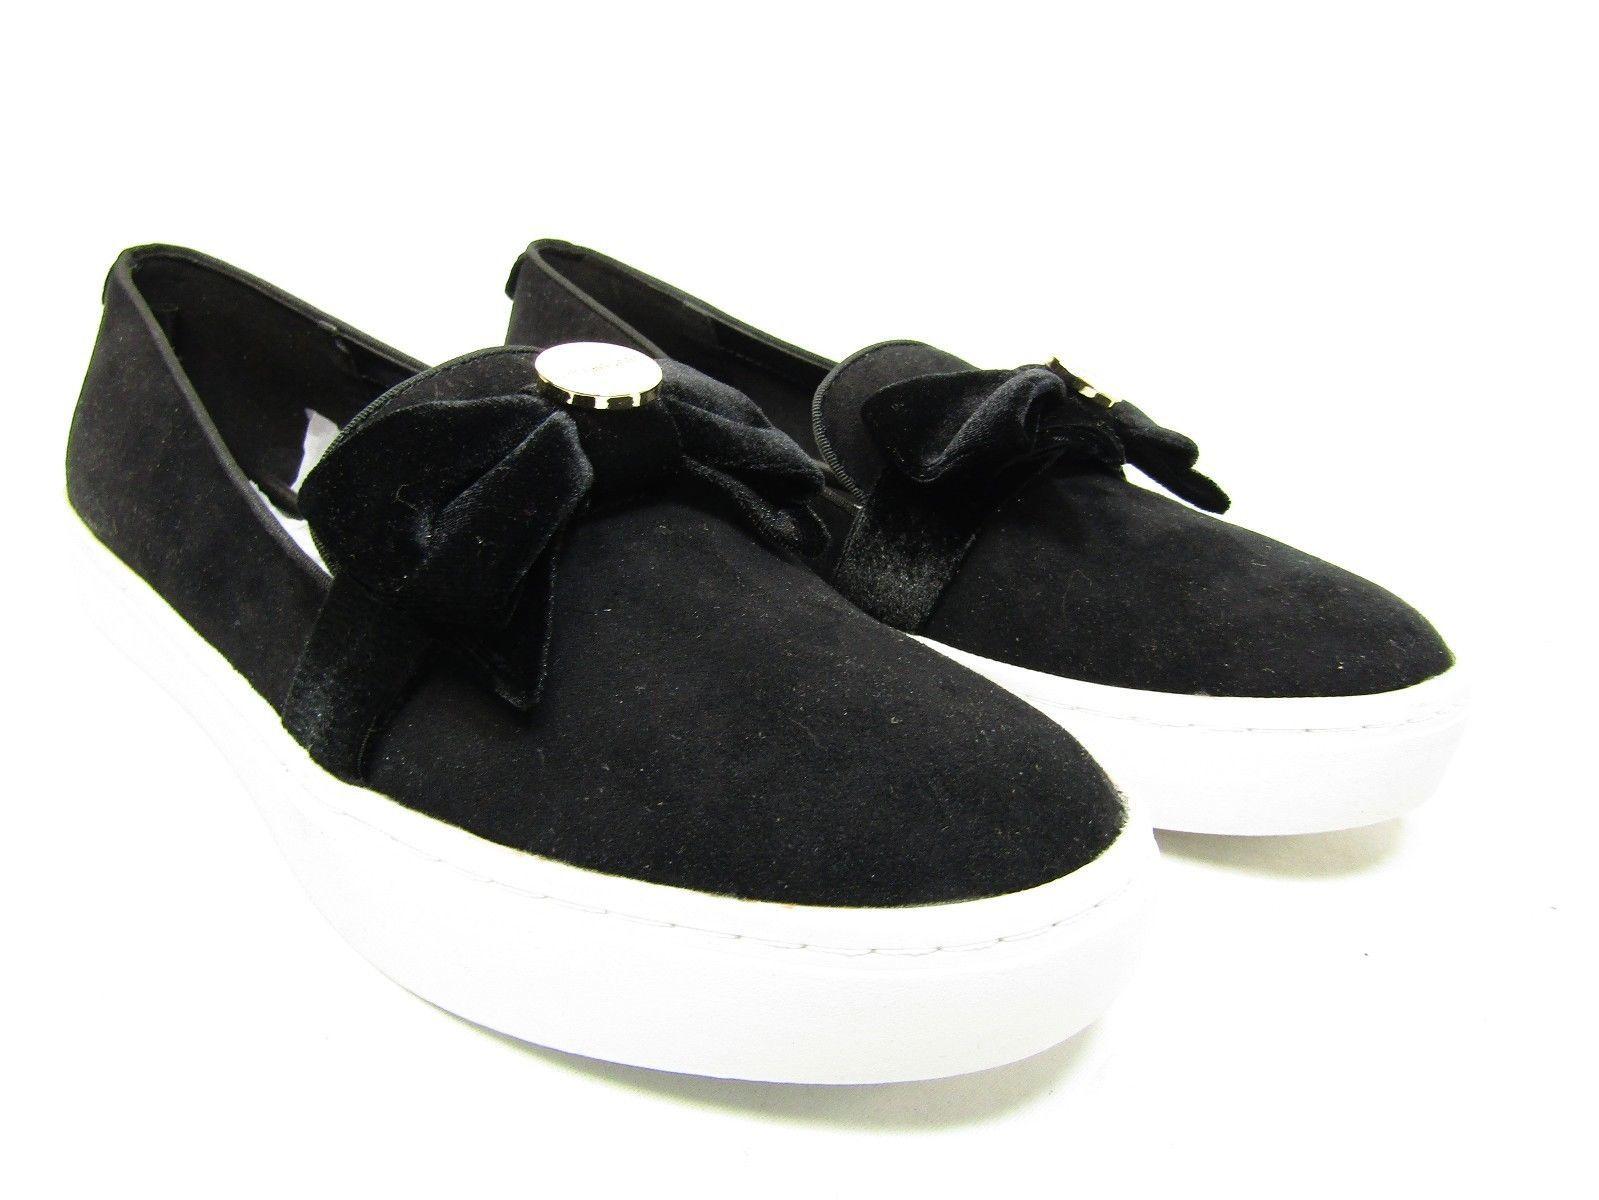 Liz Claiborne   WEAVER  Slip-On Suede Casual Loafer Black. Size 8.5 M